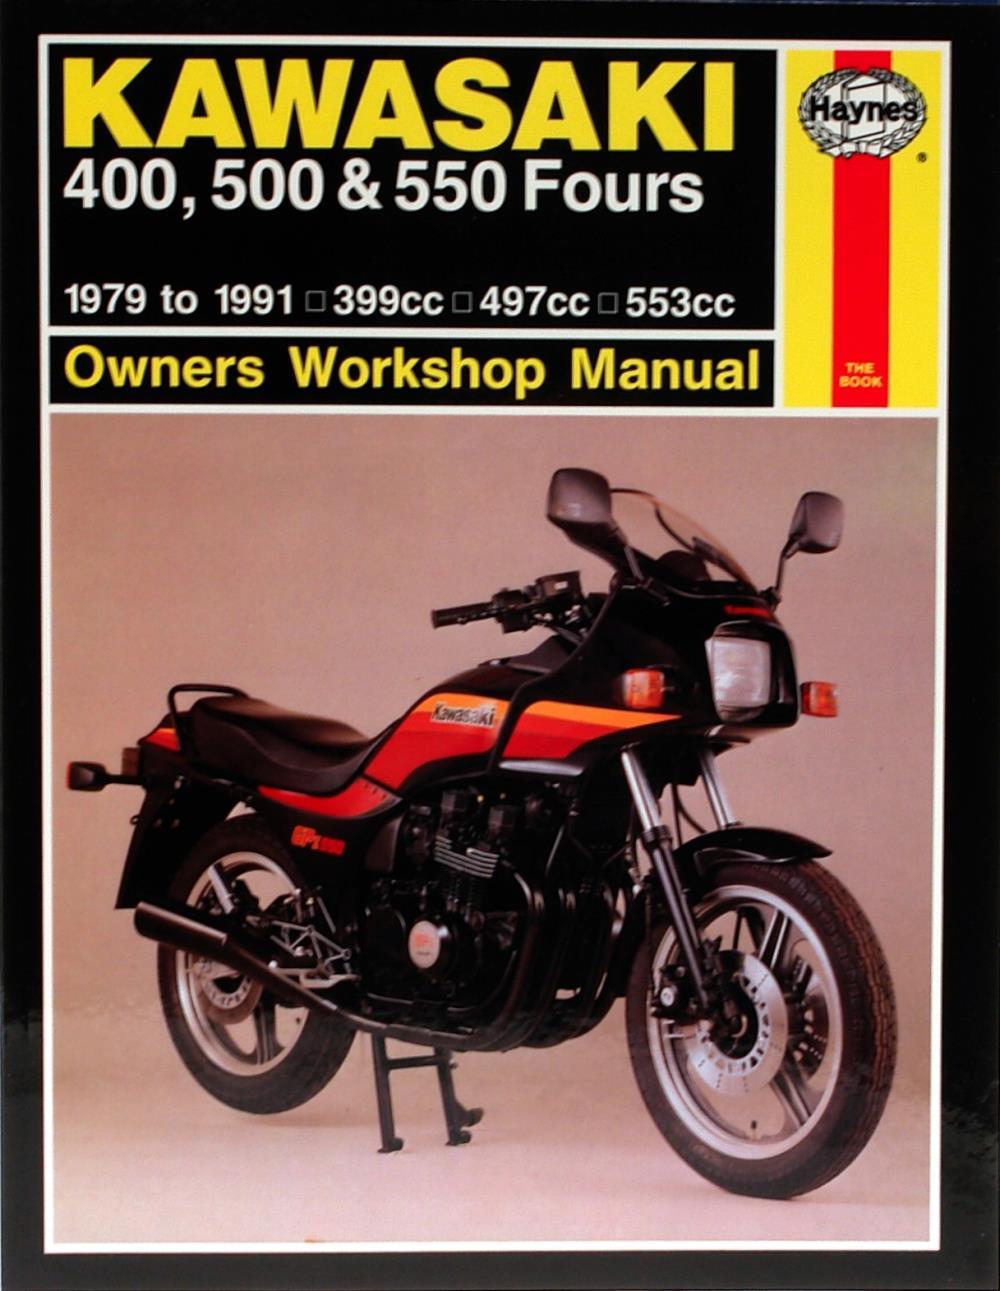 Manual Haynes for 1983 Kawasaki GPZ 550 H2 (KZ550H2)